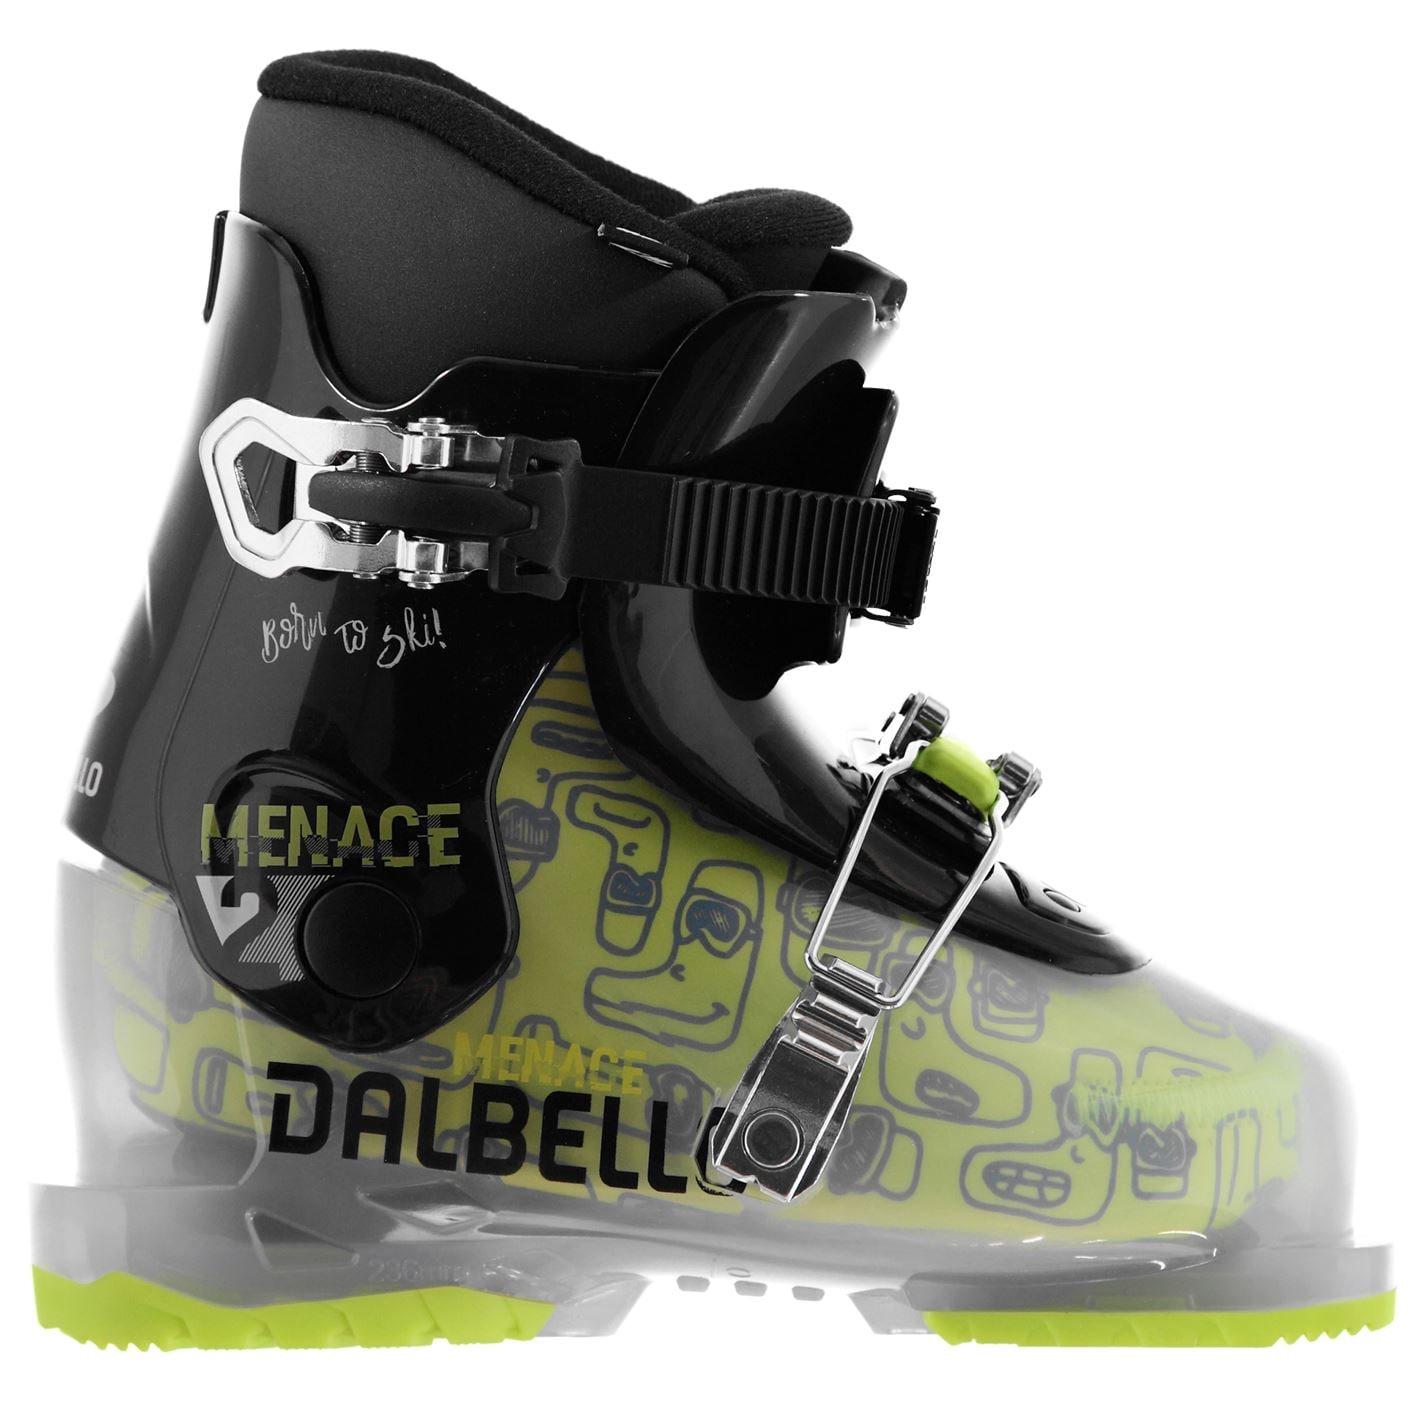 Clapari ski Dalbello Menace 2 pentru Copii trans negru